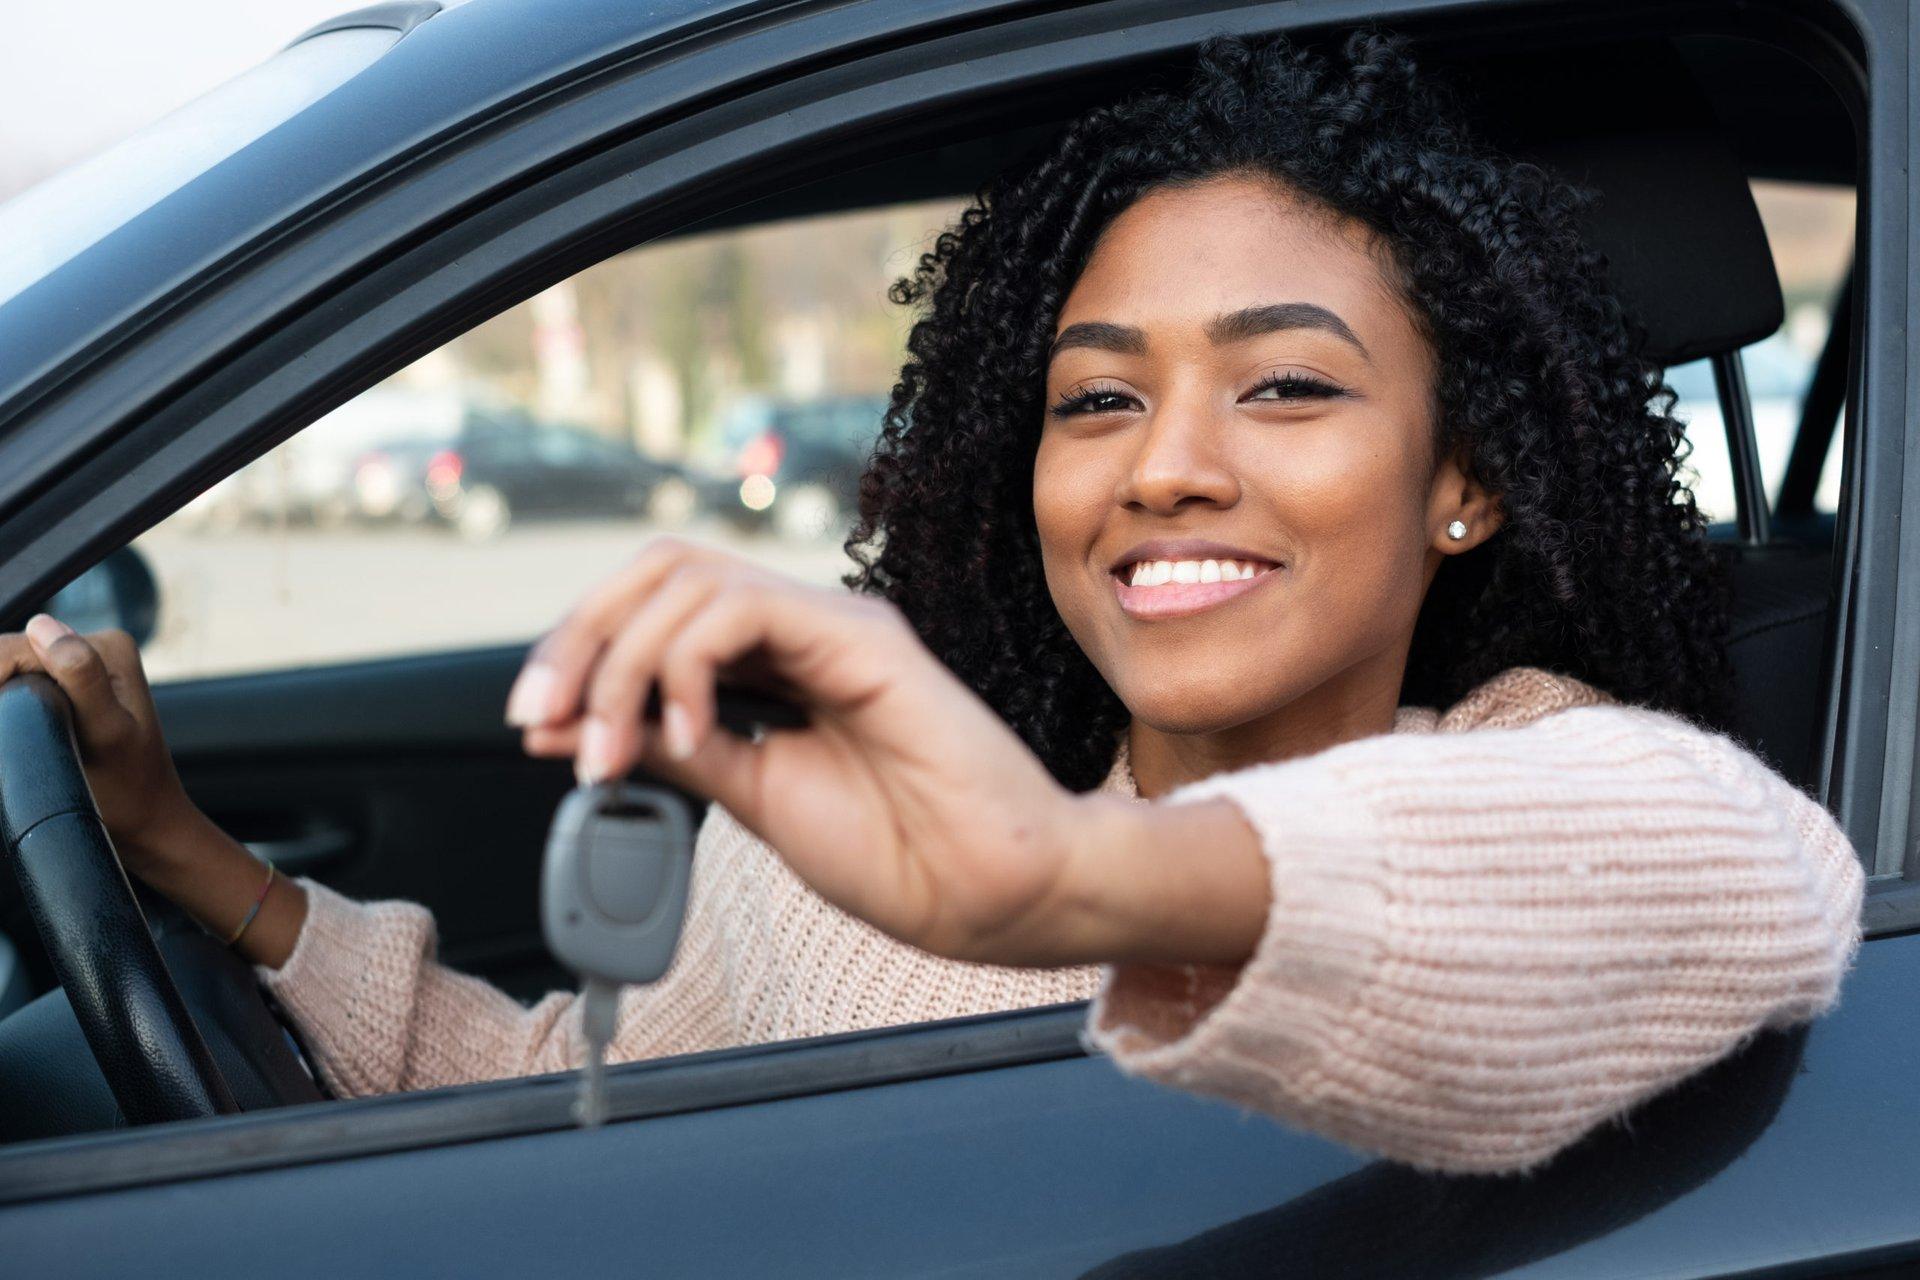 Happy female driver